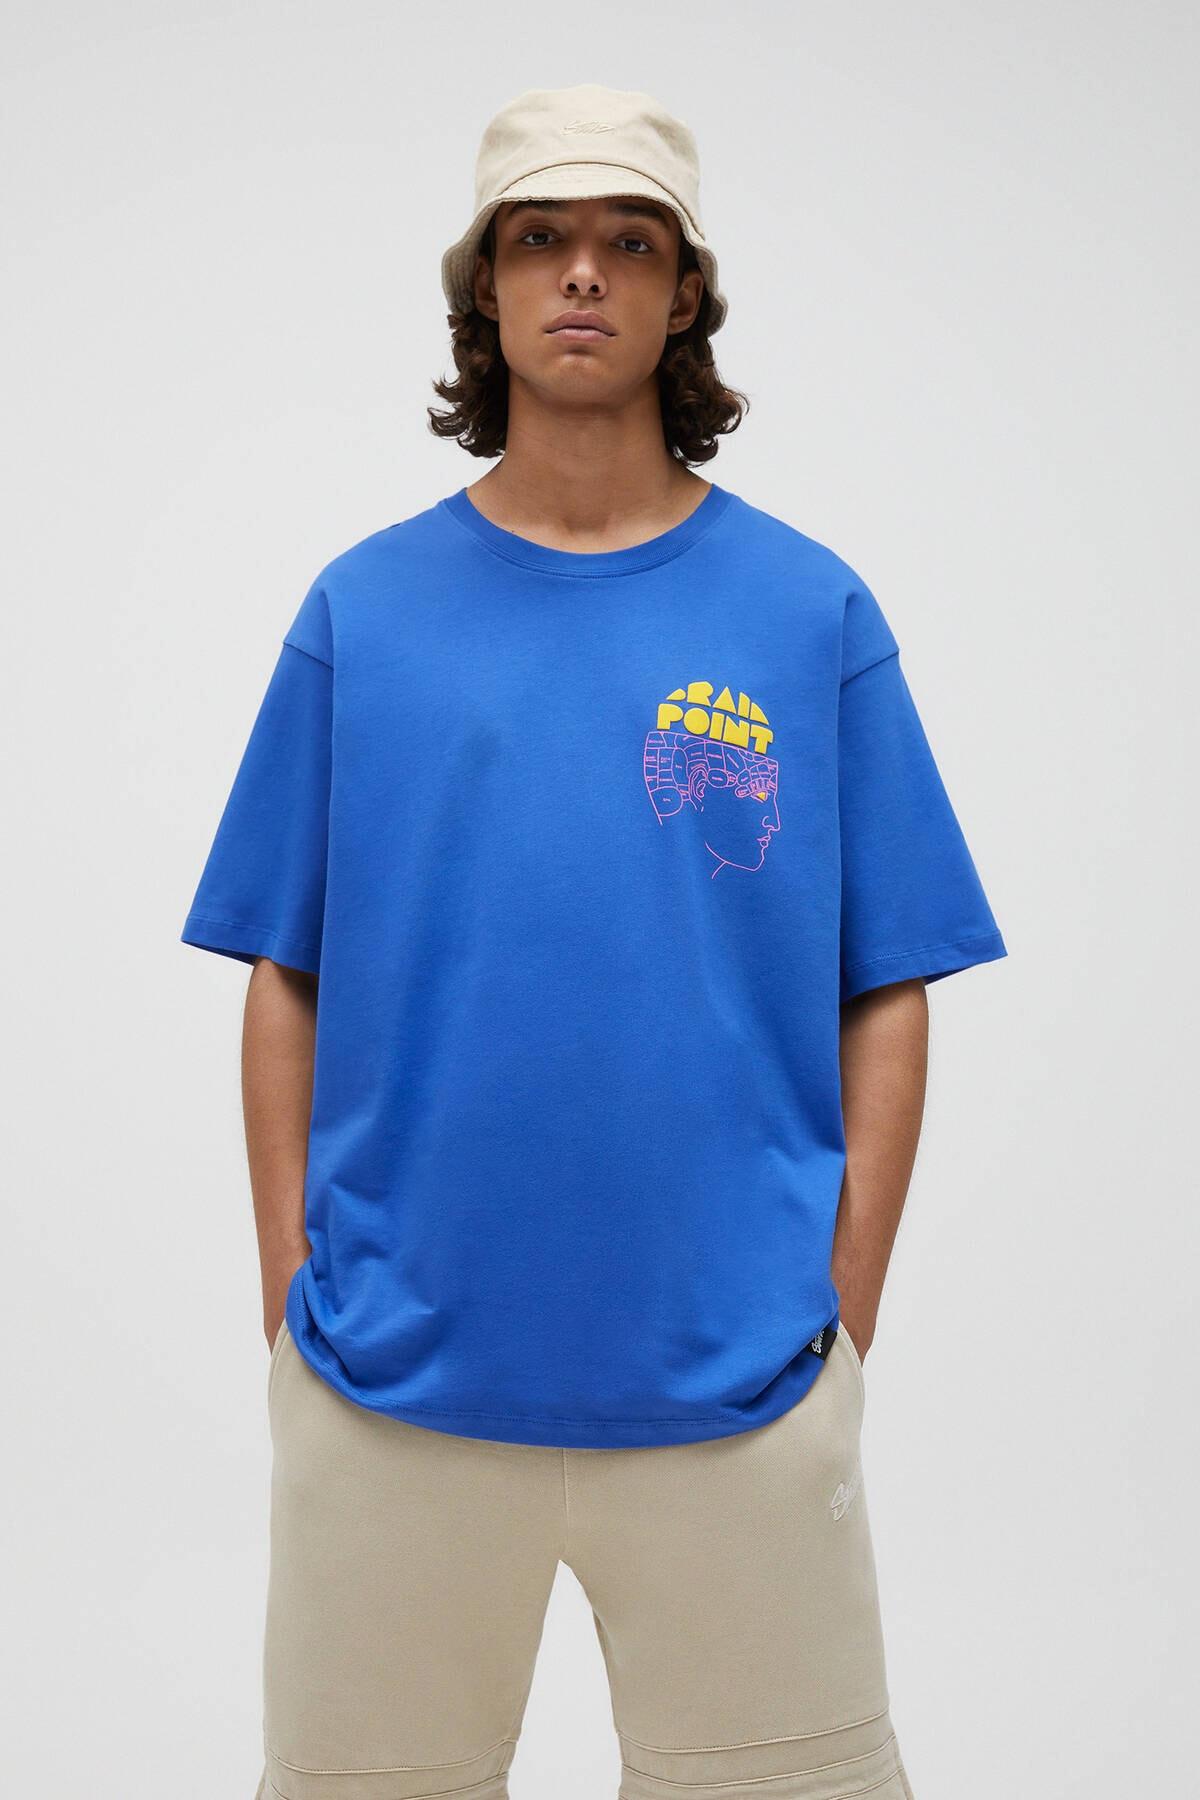 Pull & Bear Erkek Önü Baskılı Mavi T-shirt